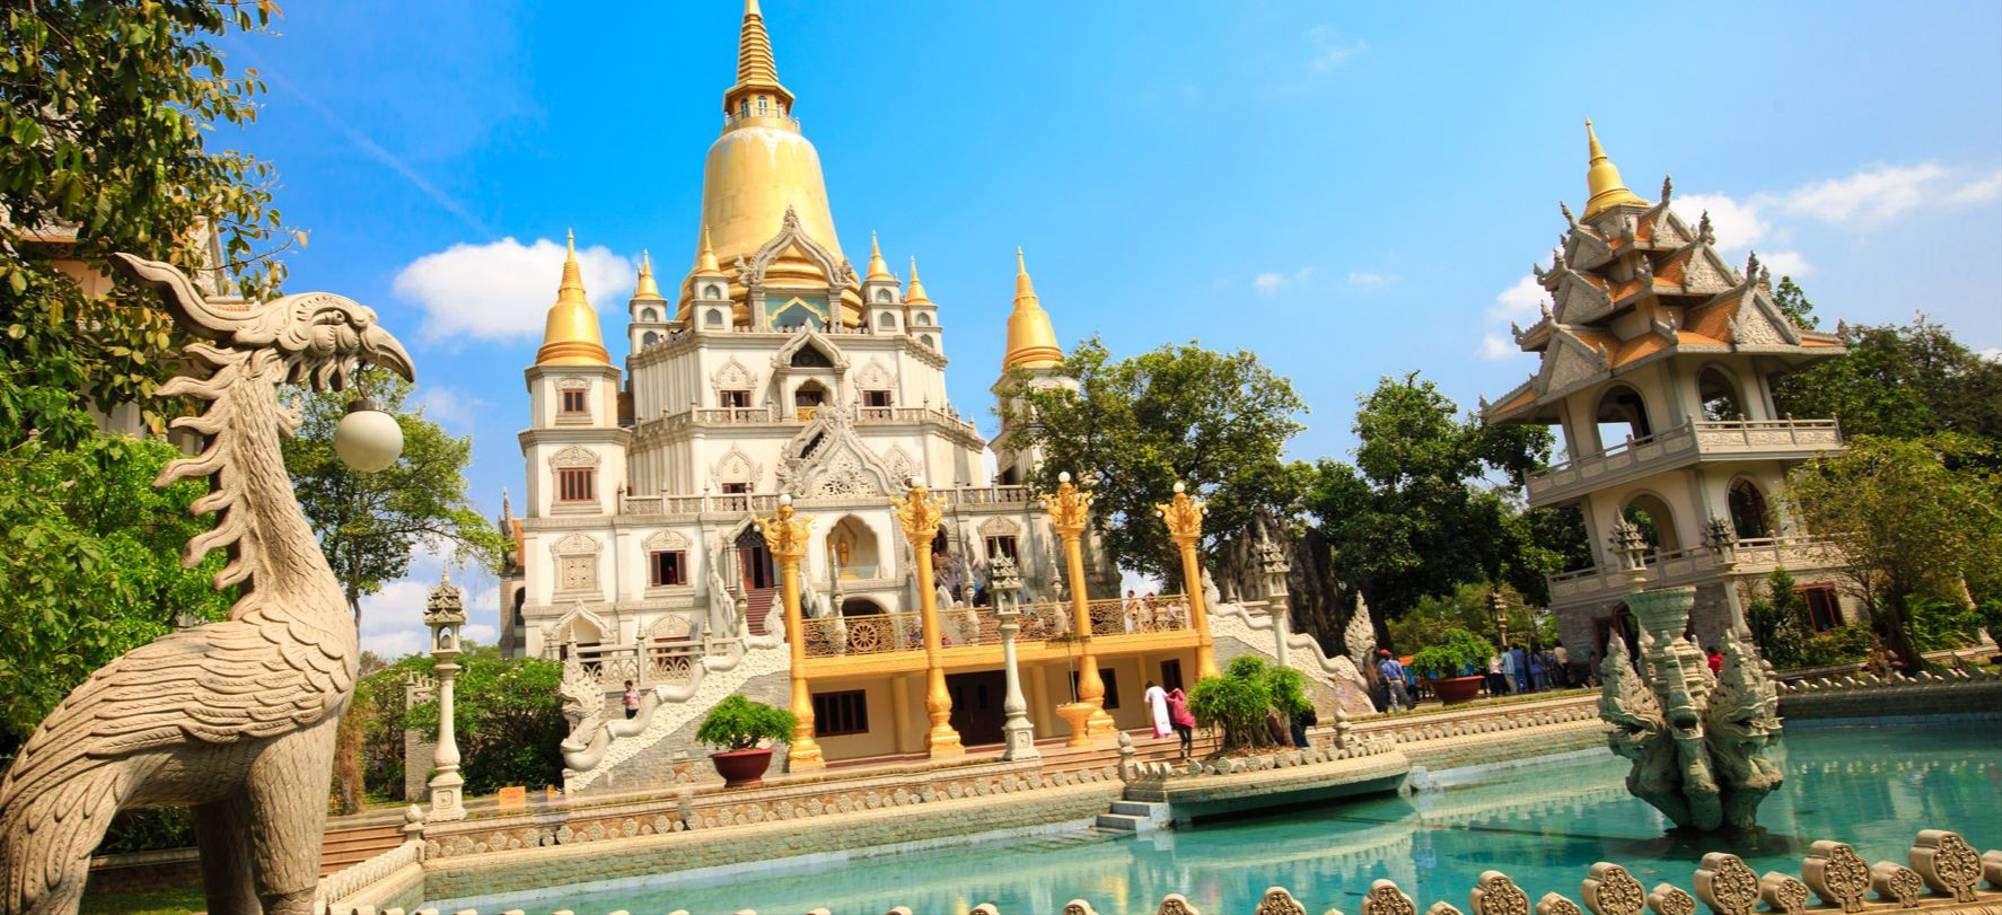 Ho Chi Minh City - Itinerary Desktop .jpg